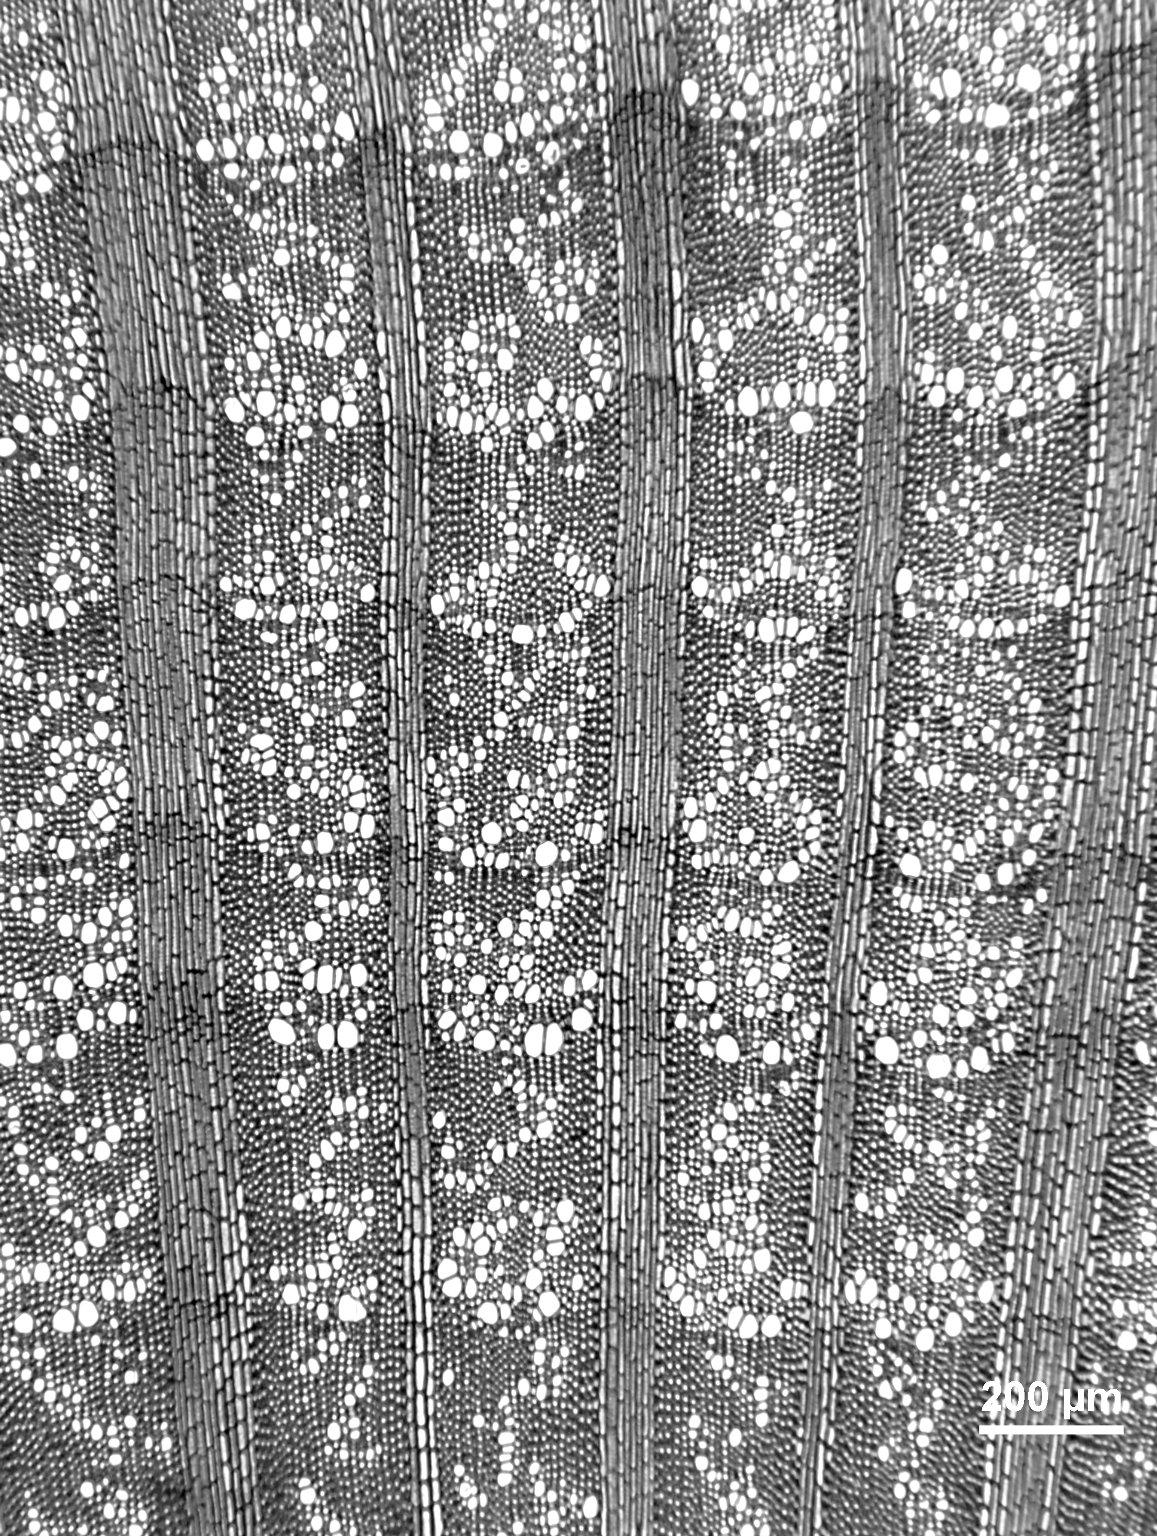 BERBERIDACEAE Berberis aquifolium